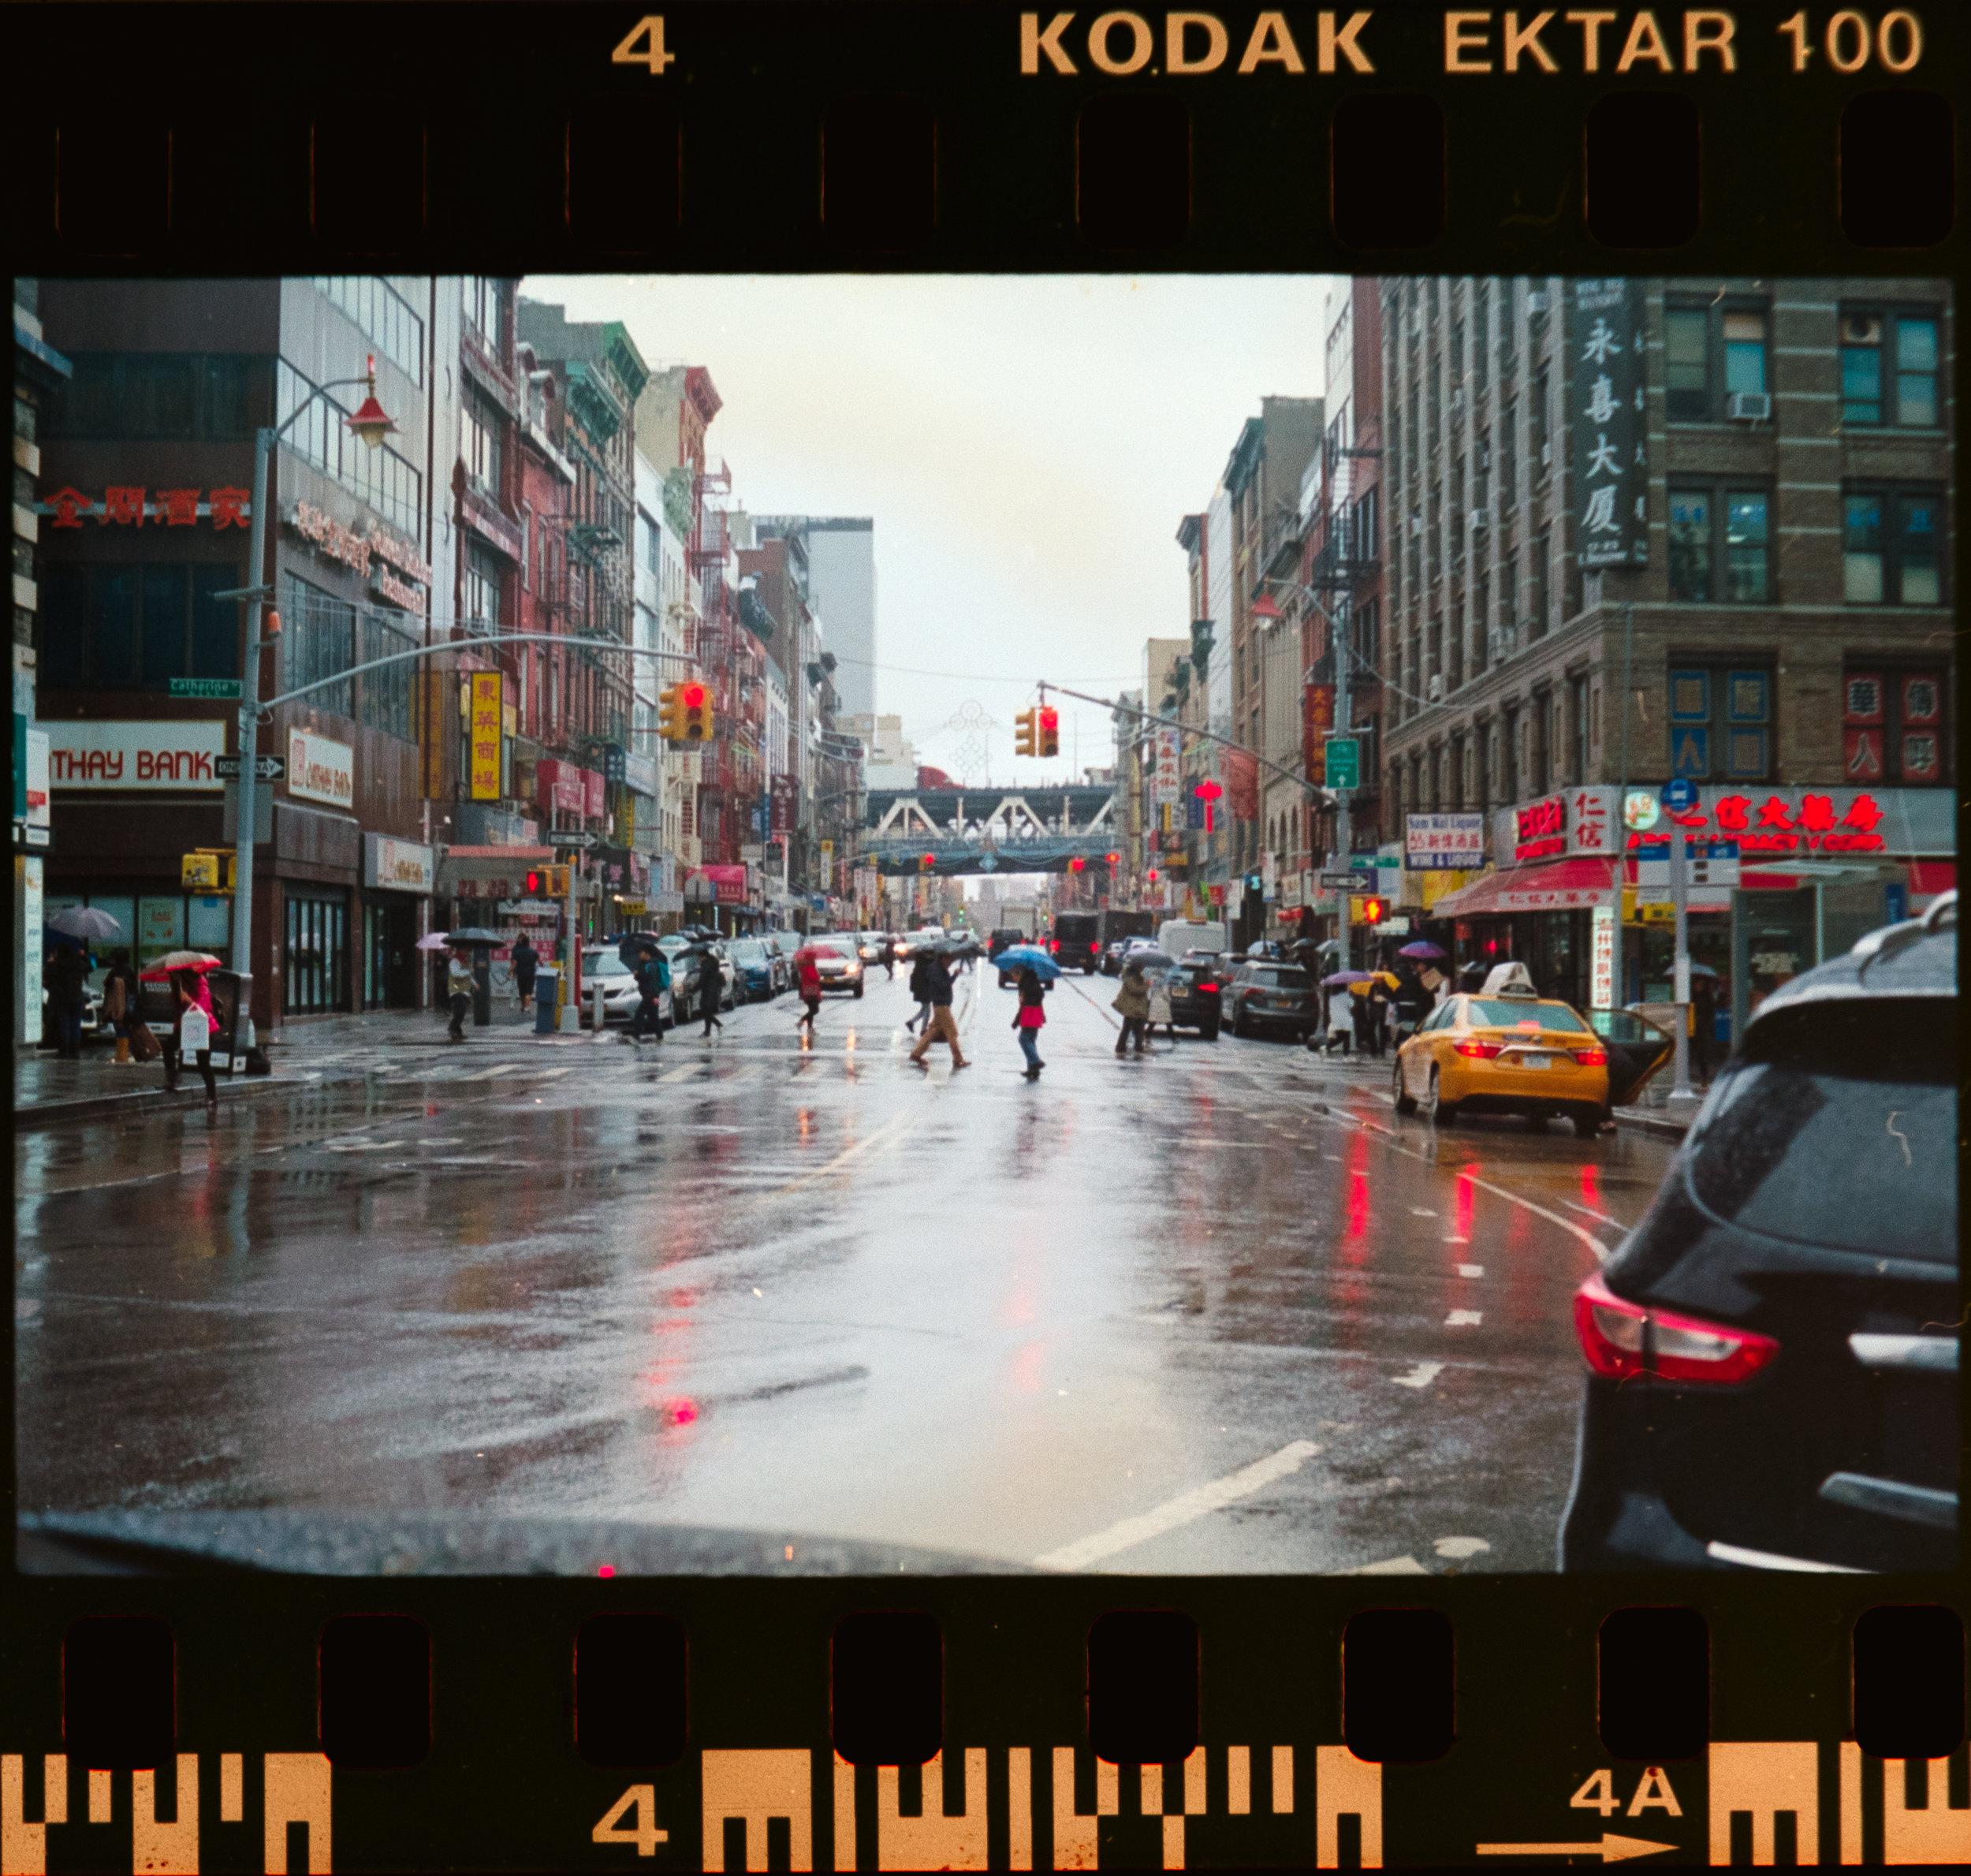 35mm-00002.jpg